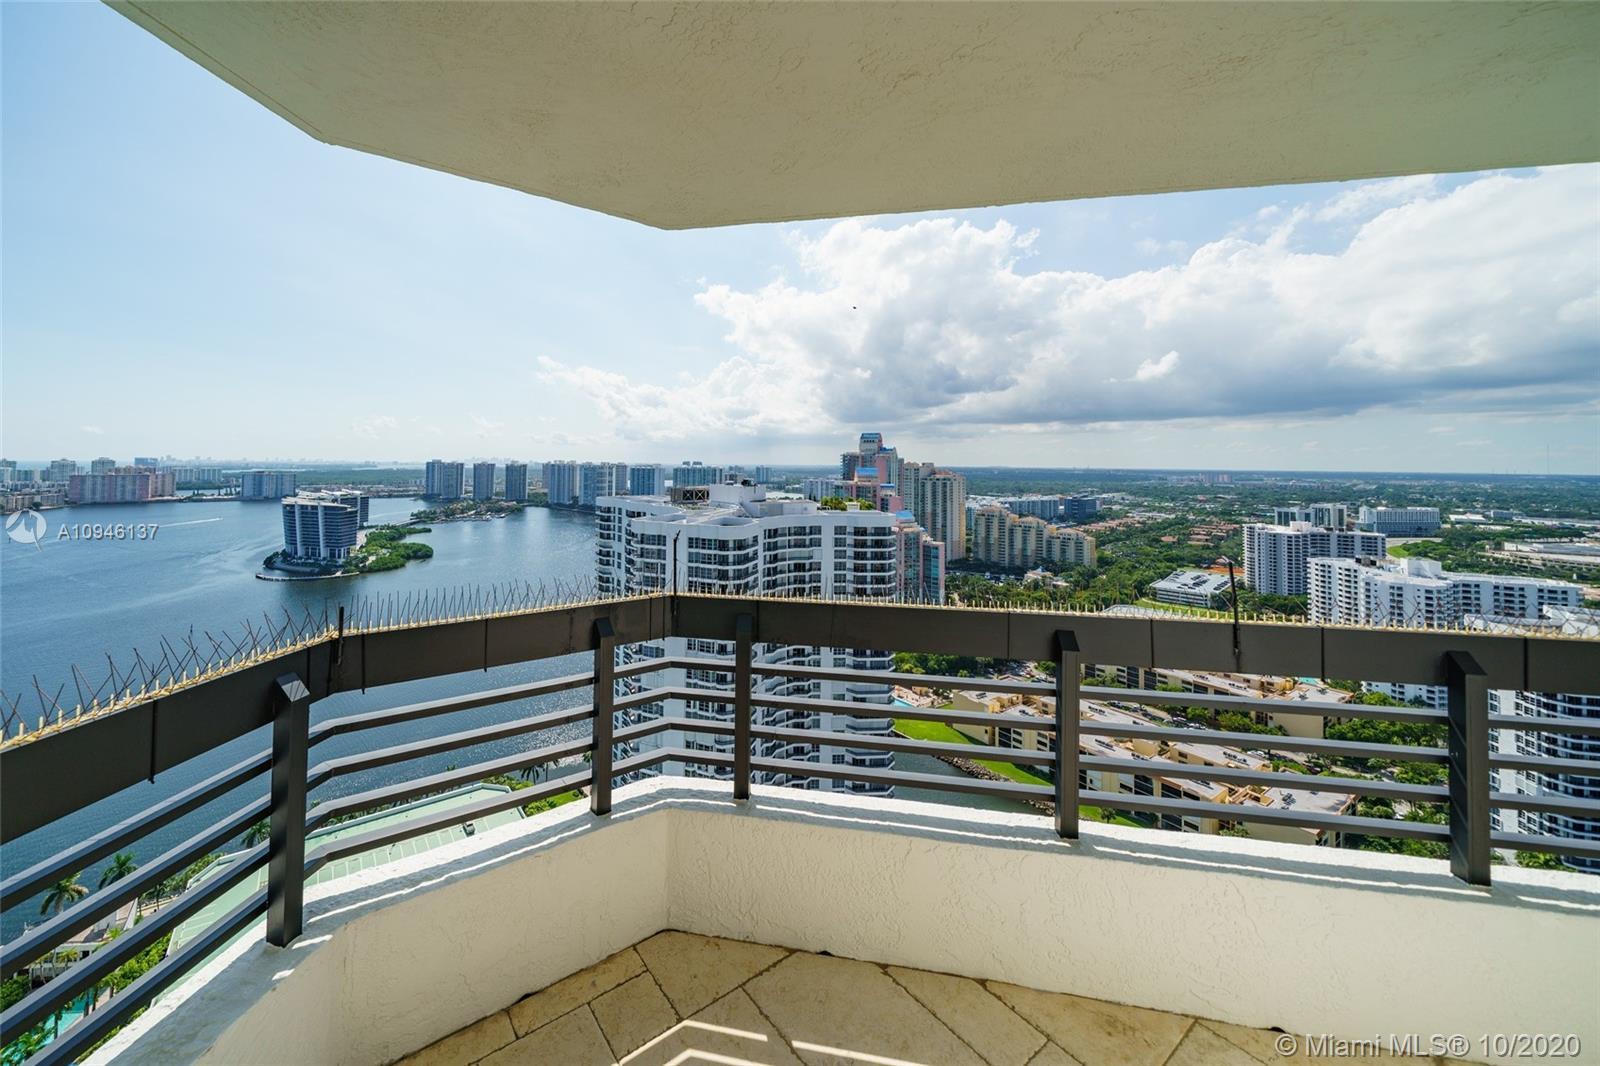 Mystic Pointe Tower 400 #LPH1 - 3500 Mystic Pointe Dr #LPH1, Aventura, FL 33180